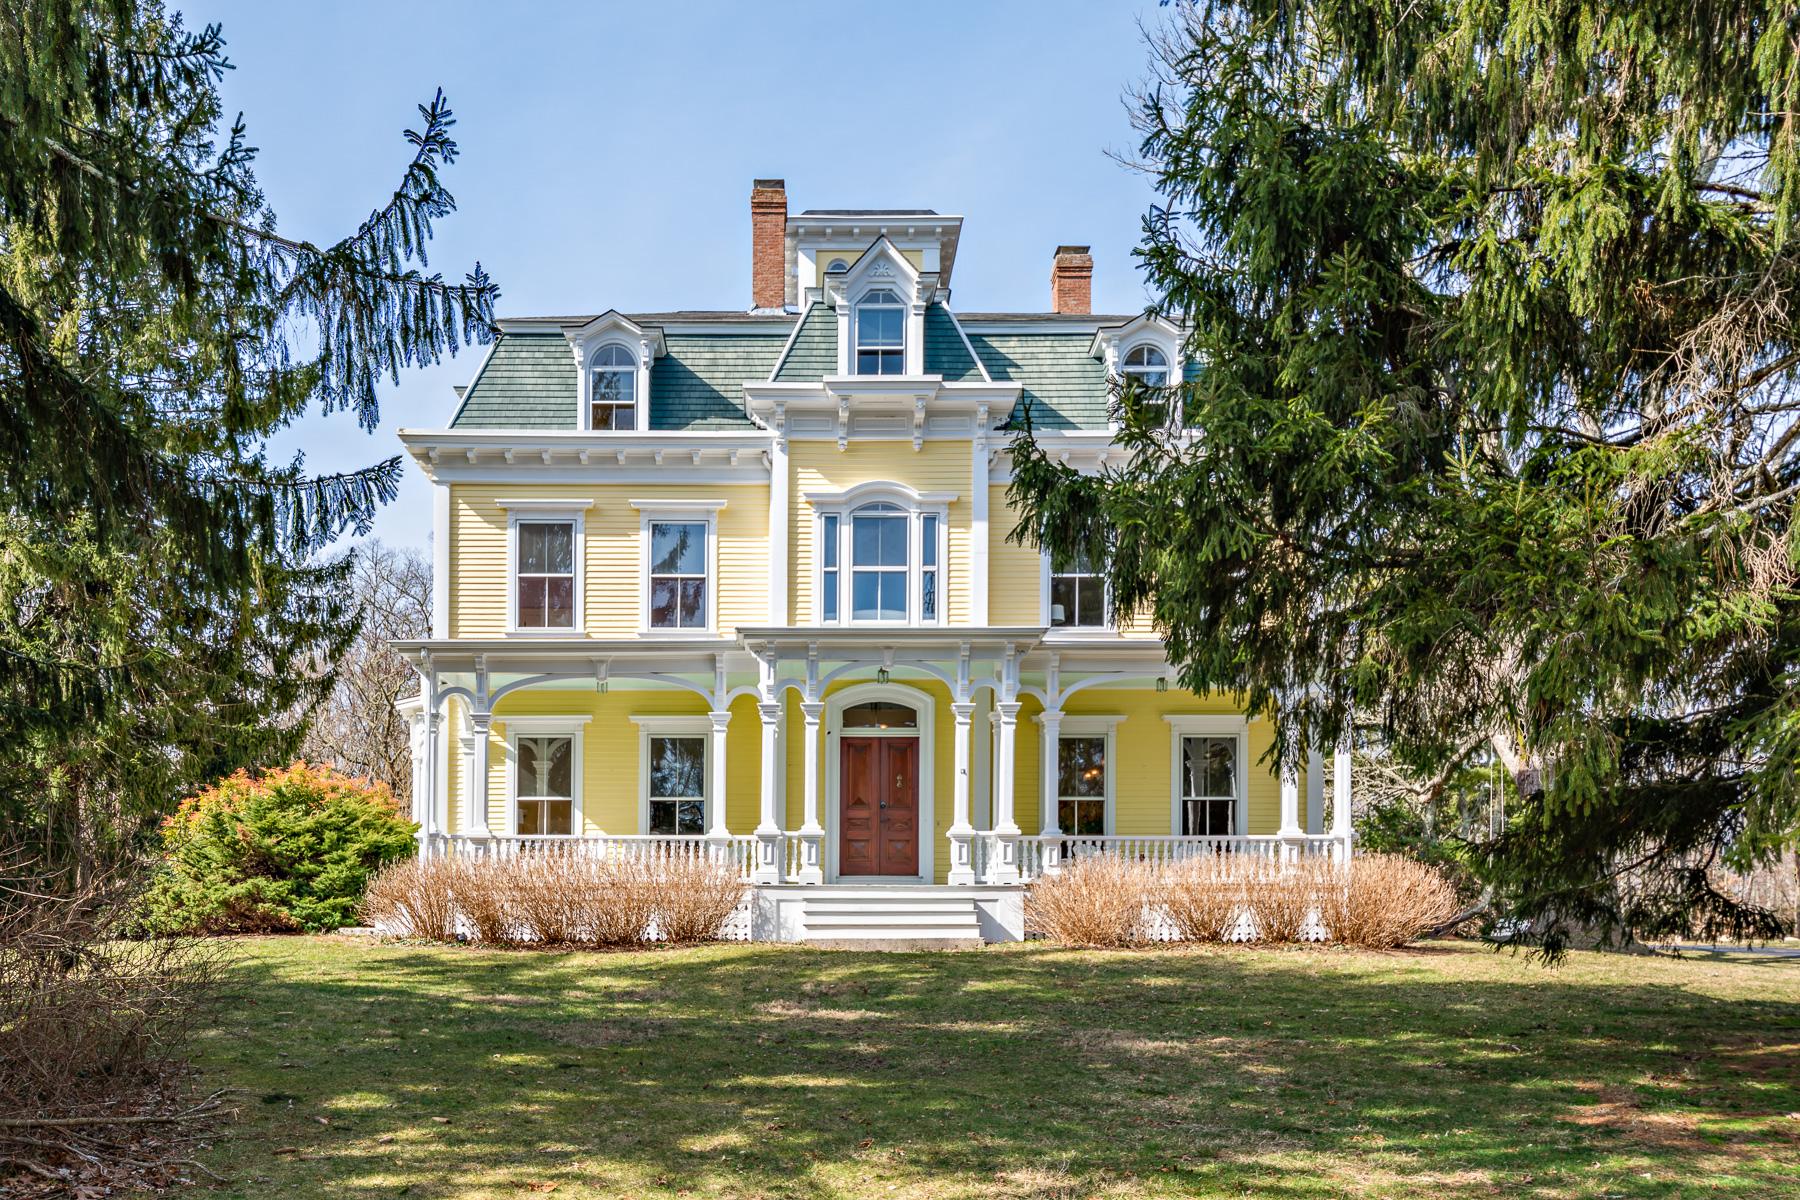 Multi-Family Homes for Sale at William Whitredge Estate 285 Stone Church Road Tiverton, Rhode Island 02878 United States